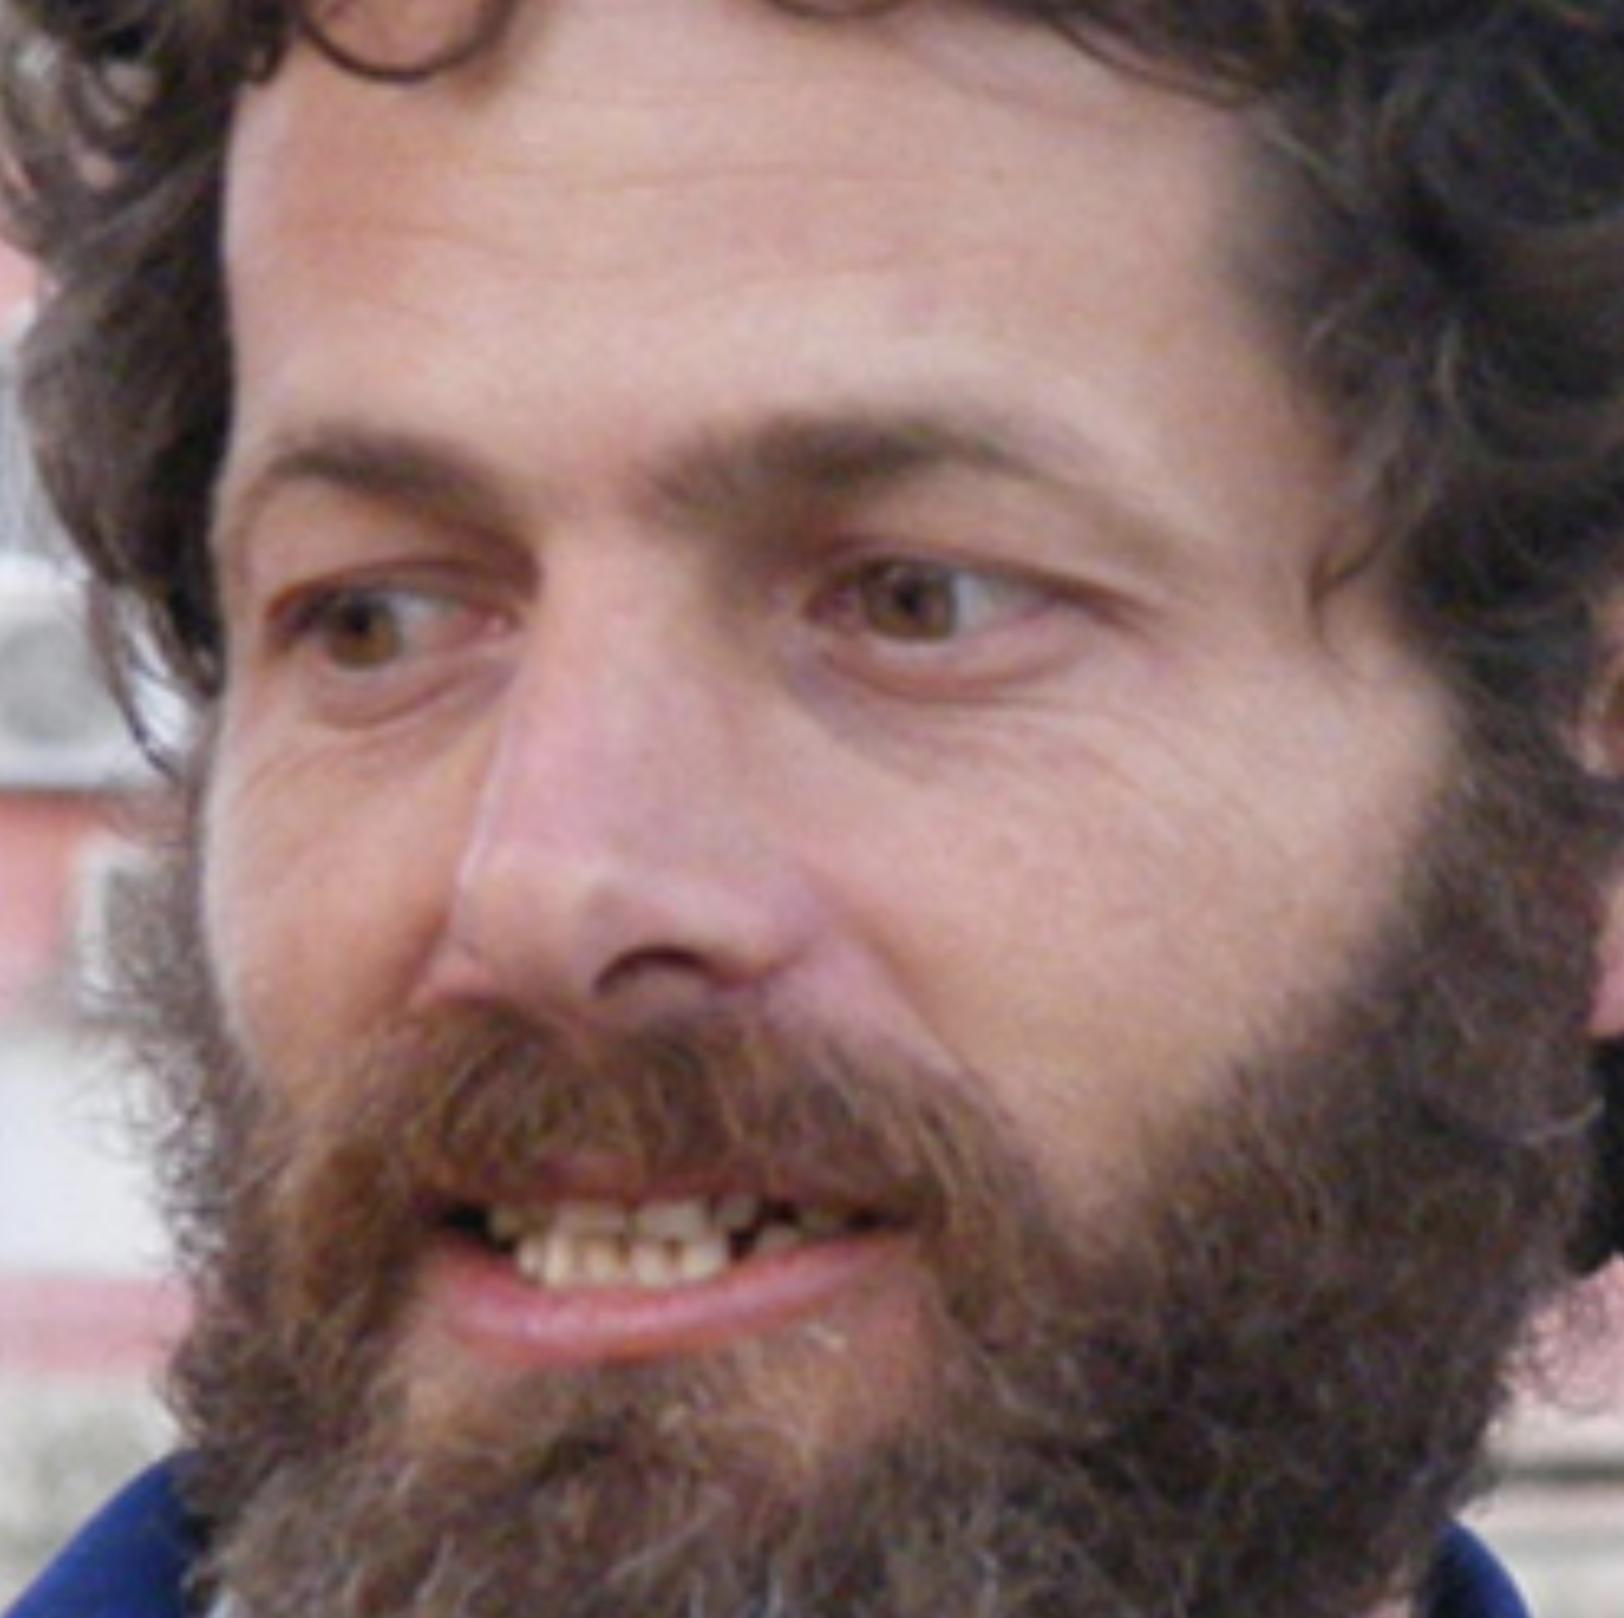 Yoav Shavit